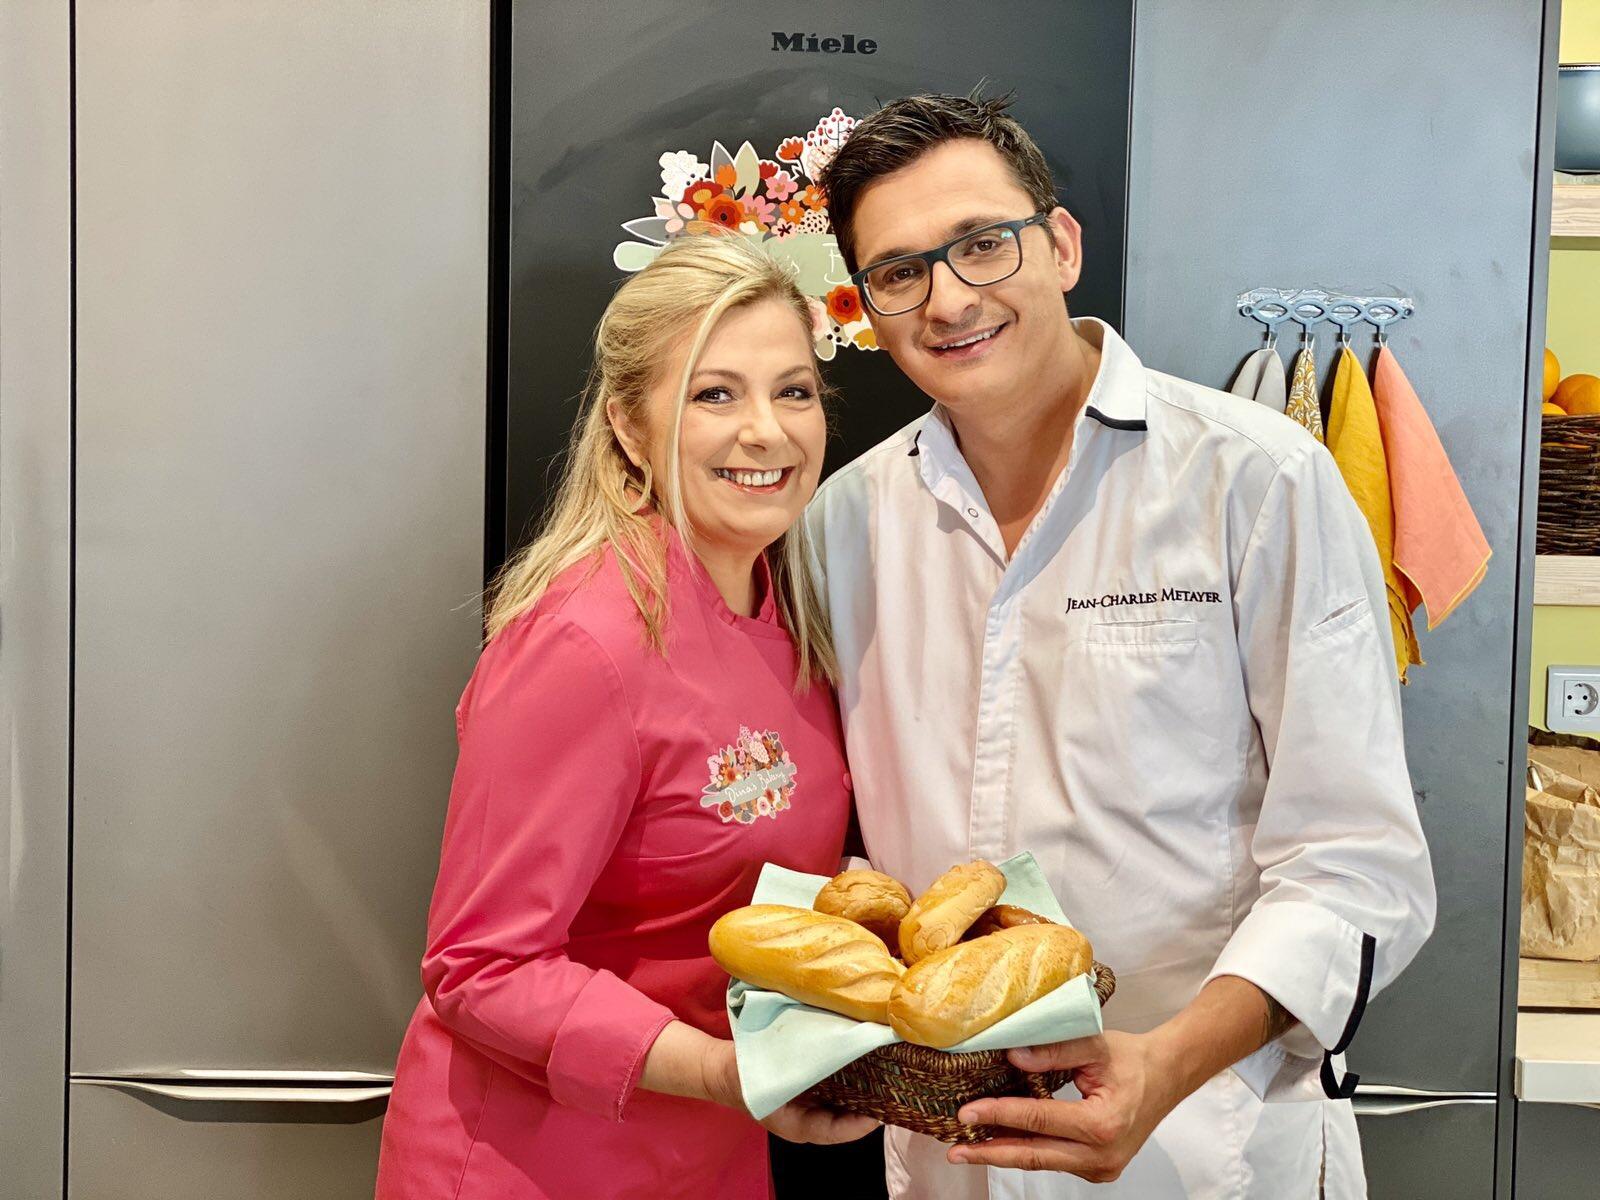 Jean Charles Metayer και Ντίνα Νικολάου Dina's Bakery